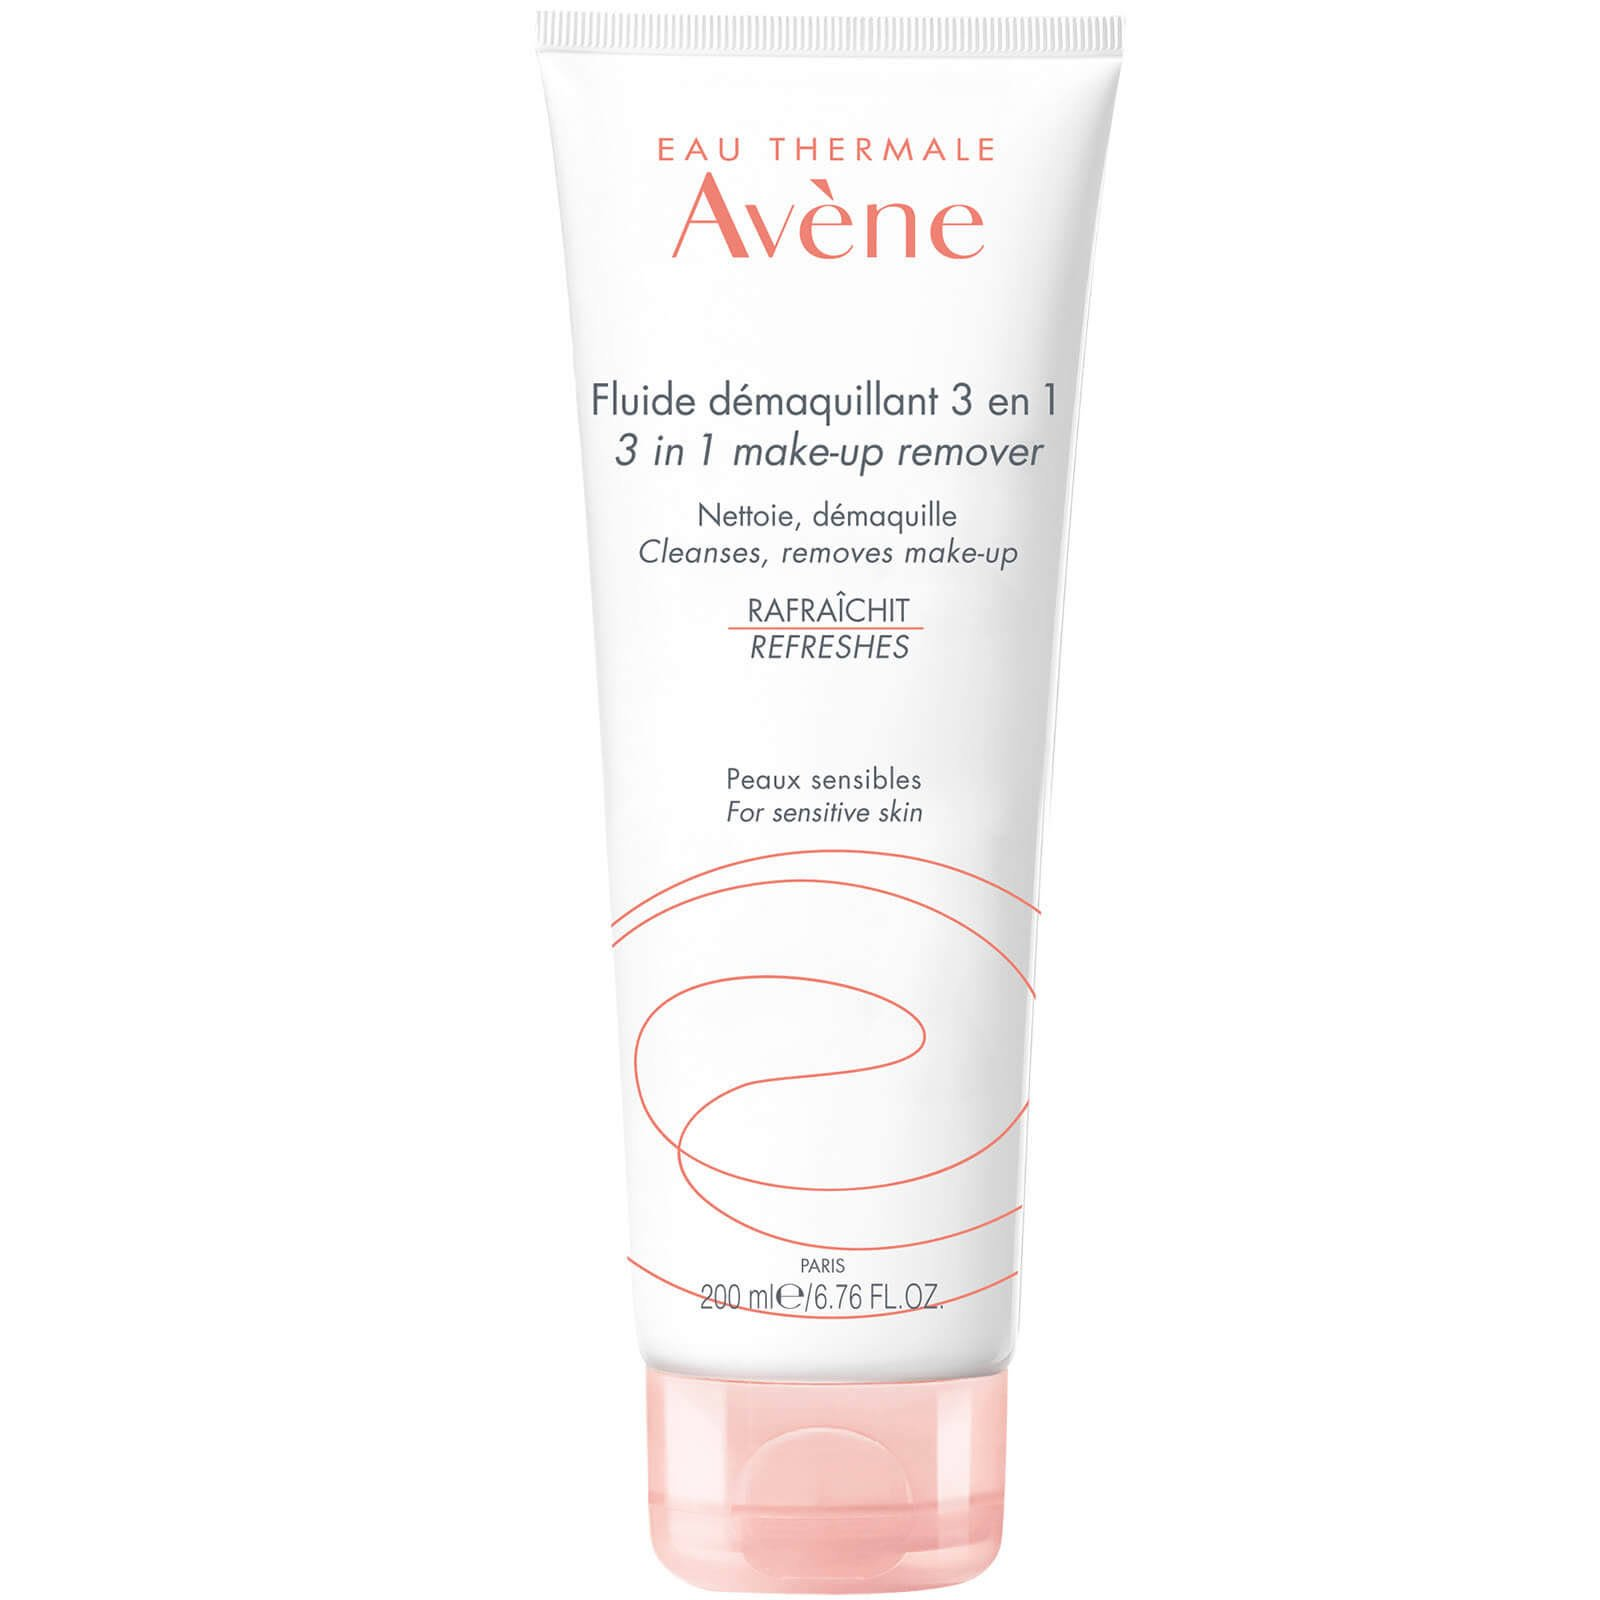 Avene 3in1 Make Up Remover Γαλάκτωμα Καθαρισμού & Ντεμακιγιάζ Κατάλληλο για Ευαίσθητες Επιδερμίδες 200ml